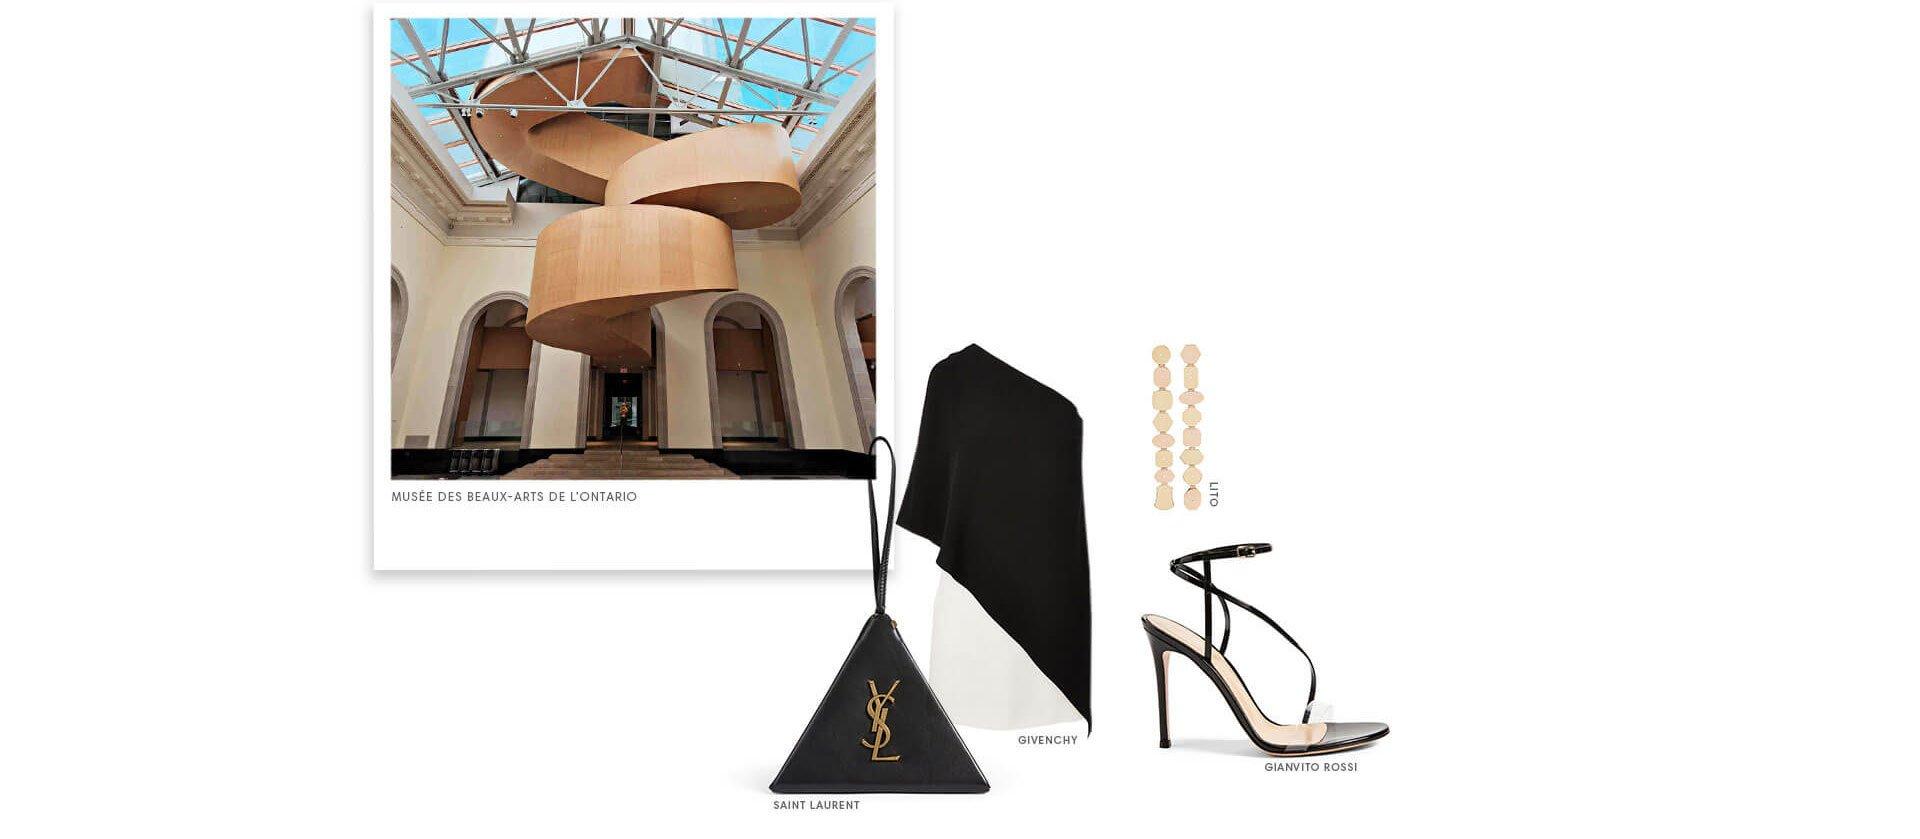 Holt Renfrew Image de Art Gallery Of Ontario. Lito. Sant Luarent. Givenchy. Gianvito Rossi